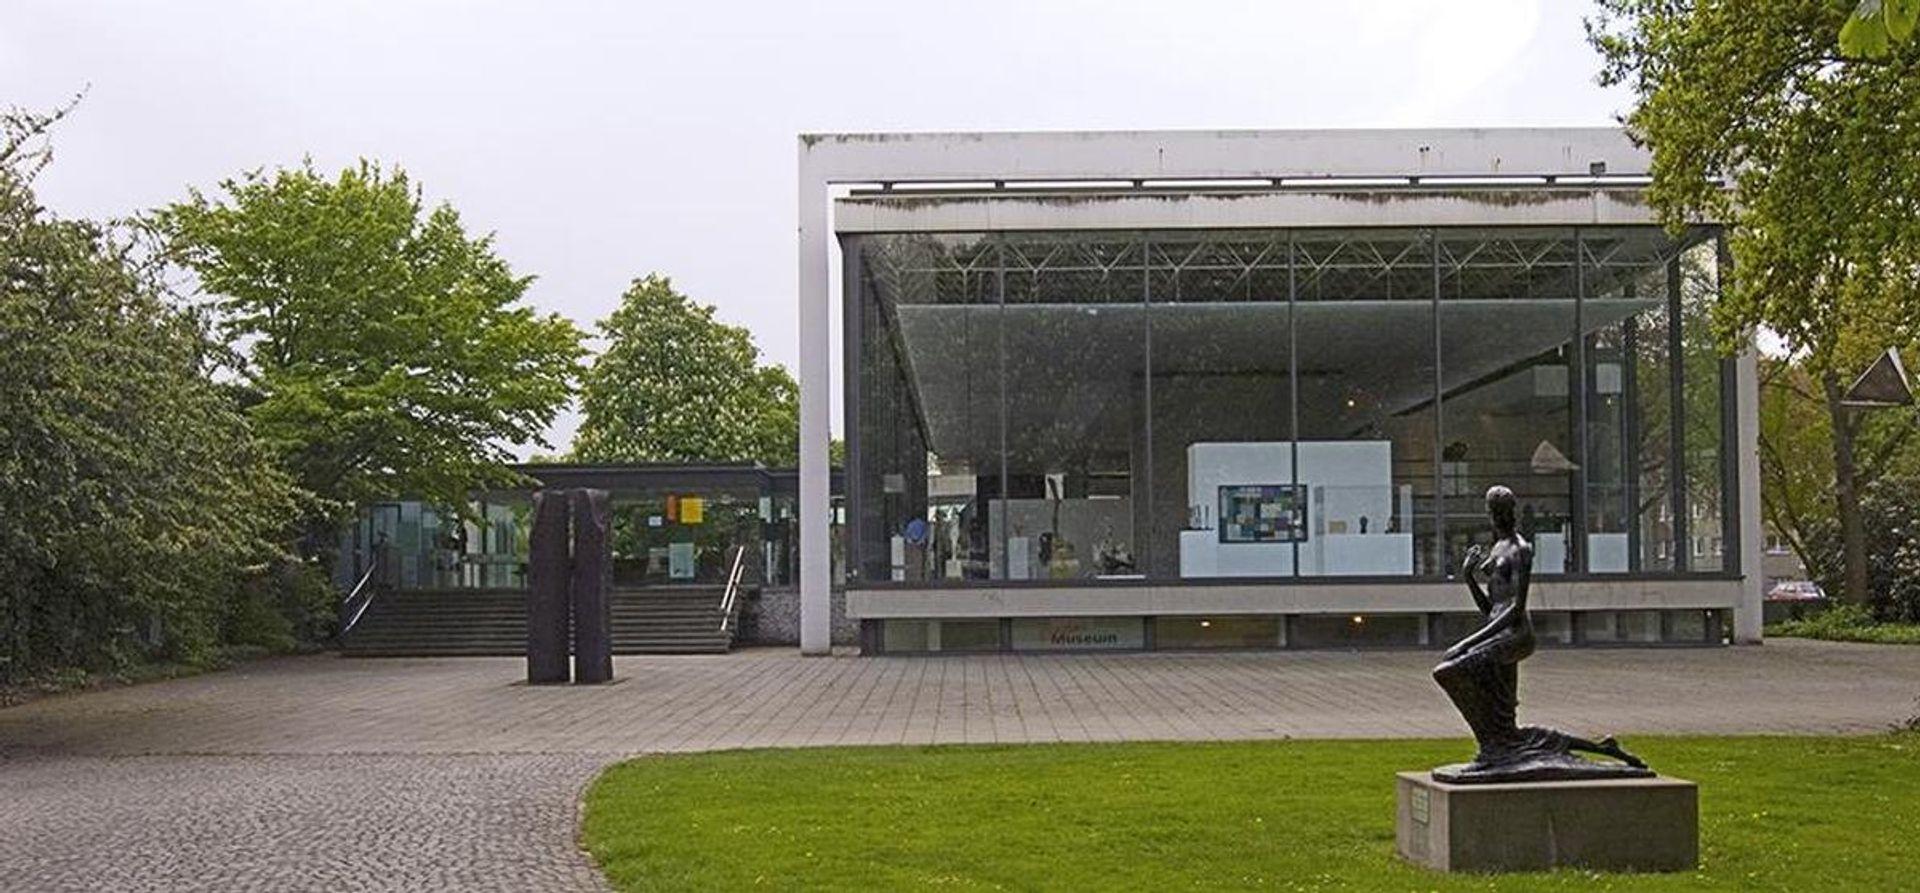 Wilhelm-Lehmbruck-Museum in Duisburg, Germany